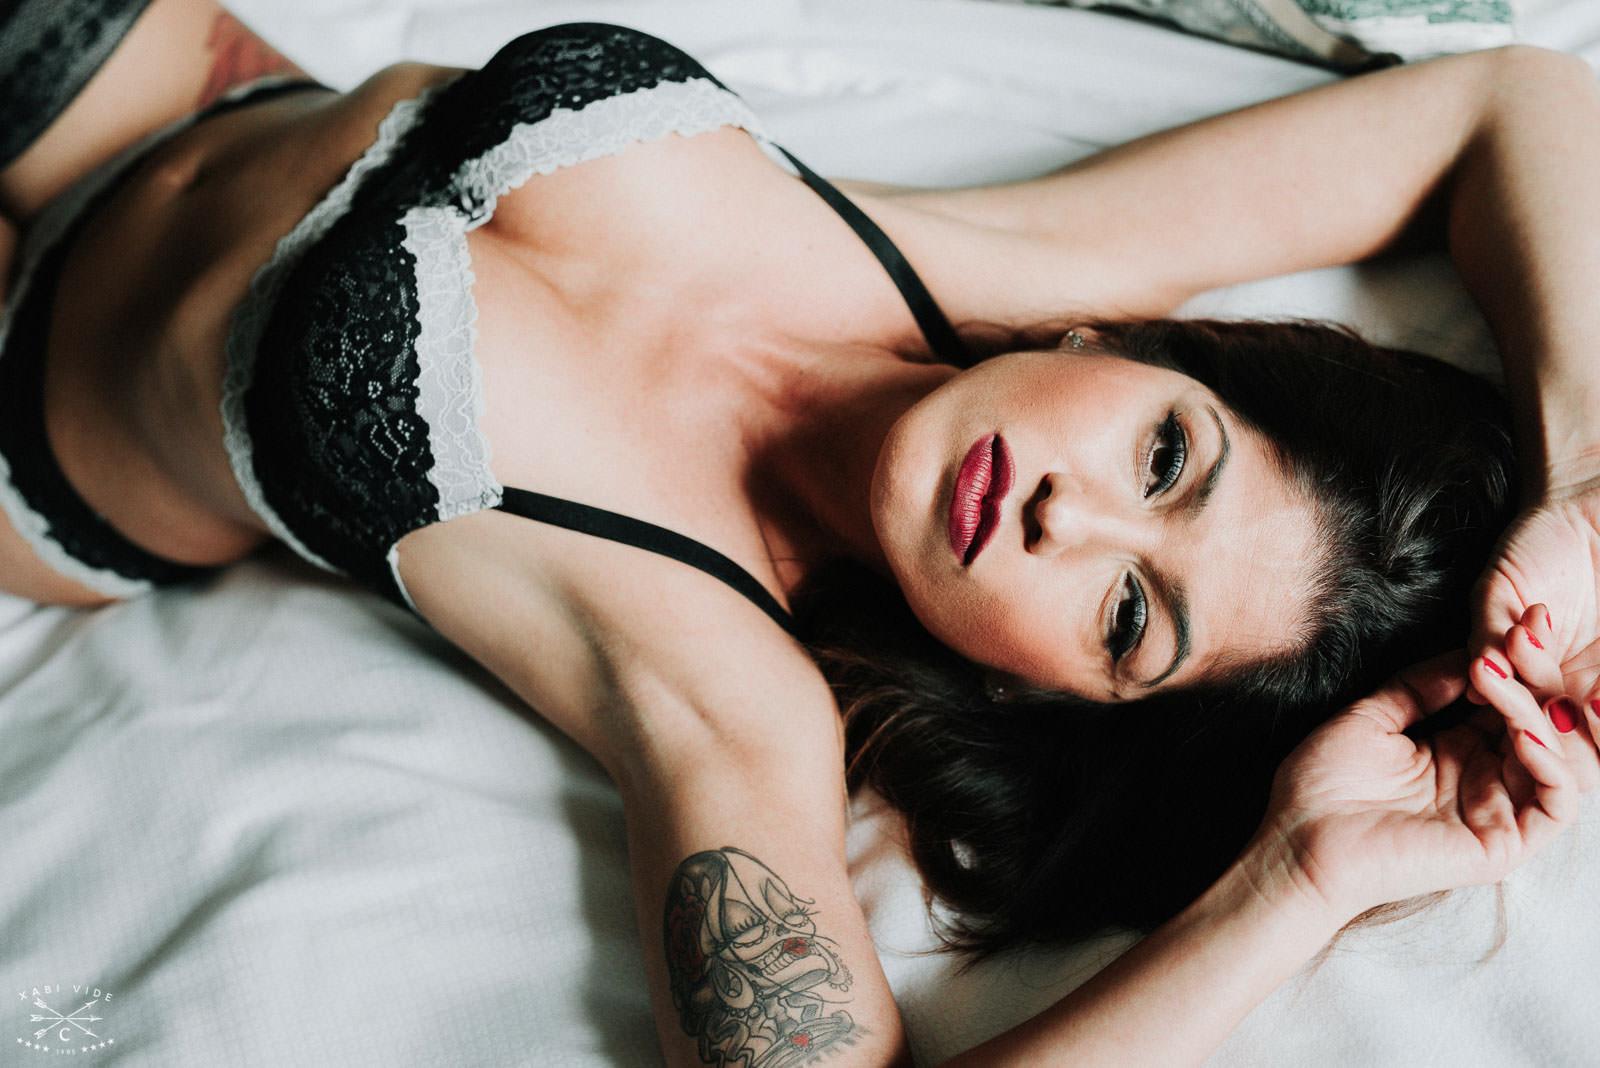 fotografía boudoir-24